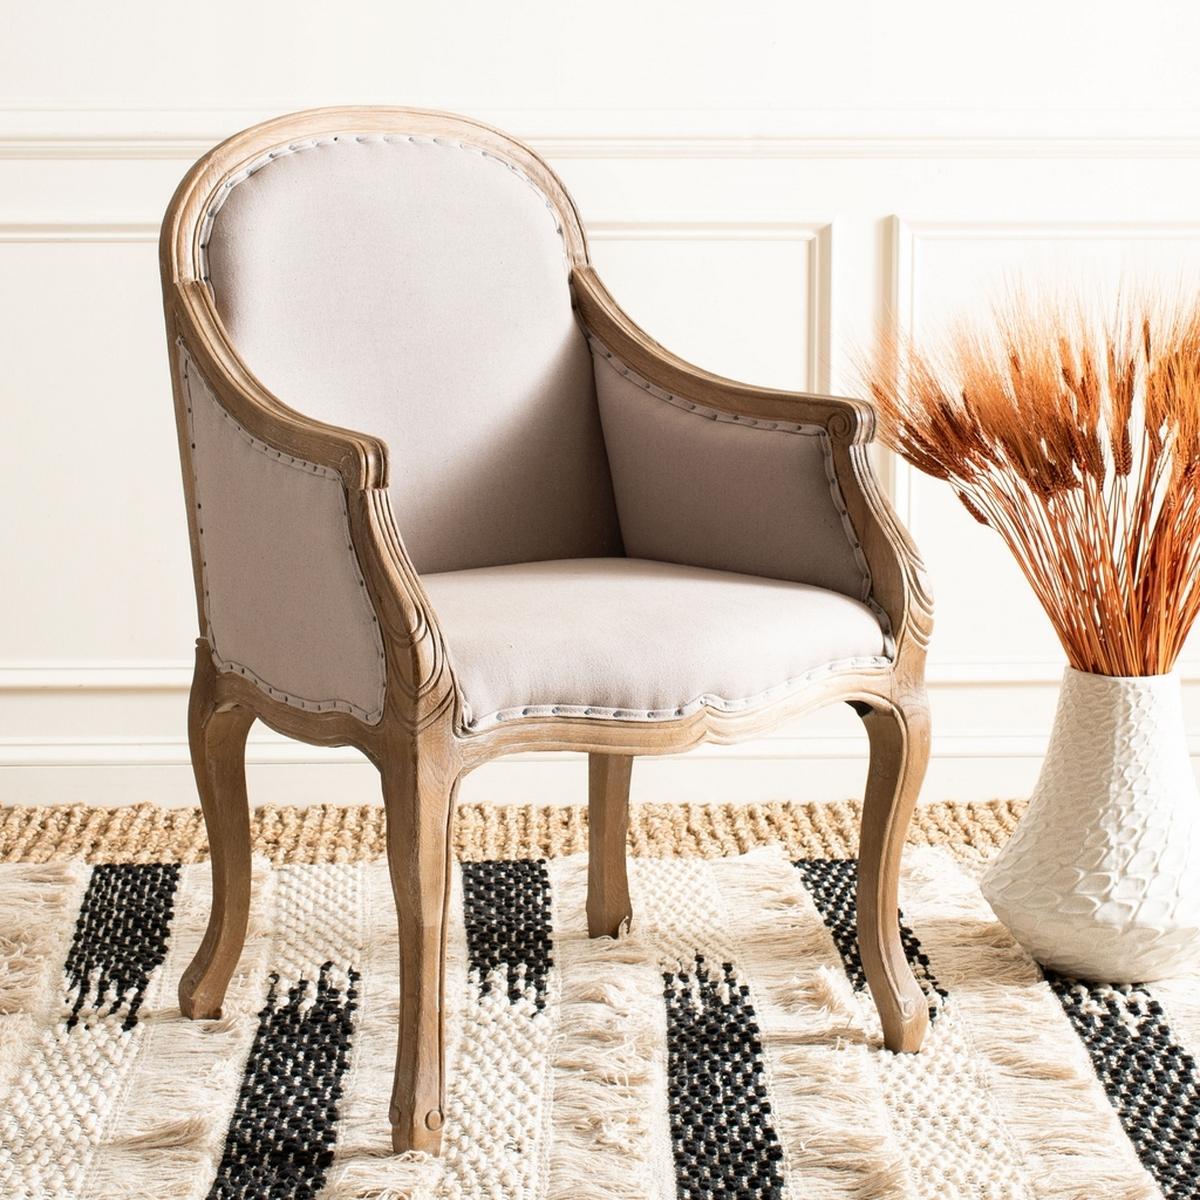 MCR4575A Accent Chairs - Furniture by Safavieh  Safavieh